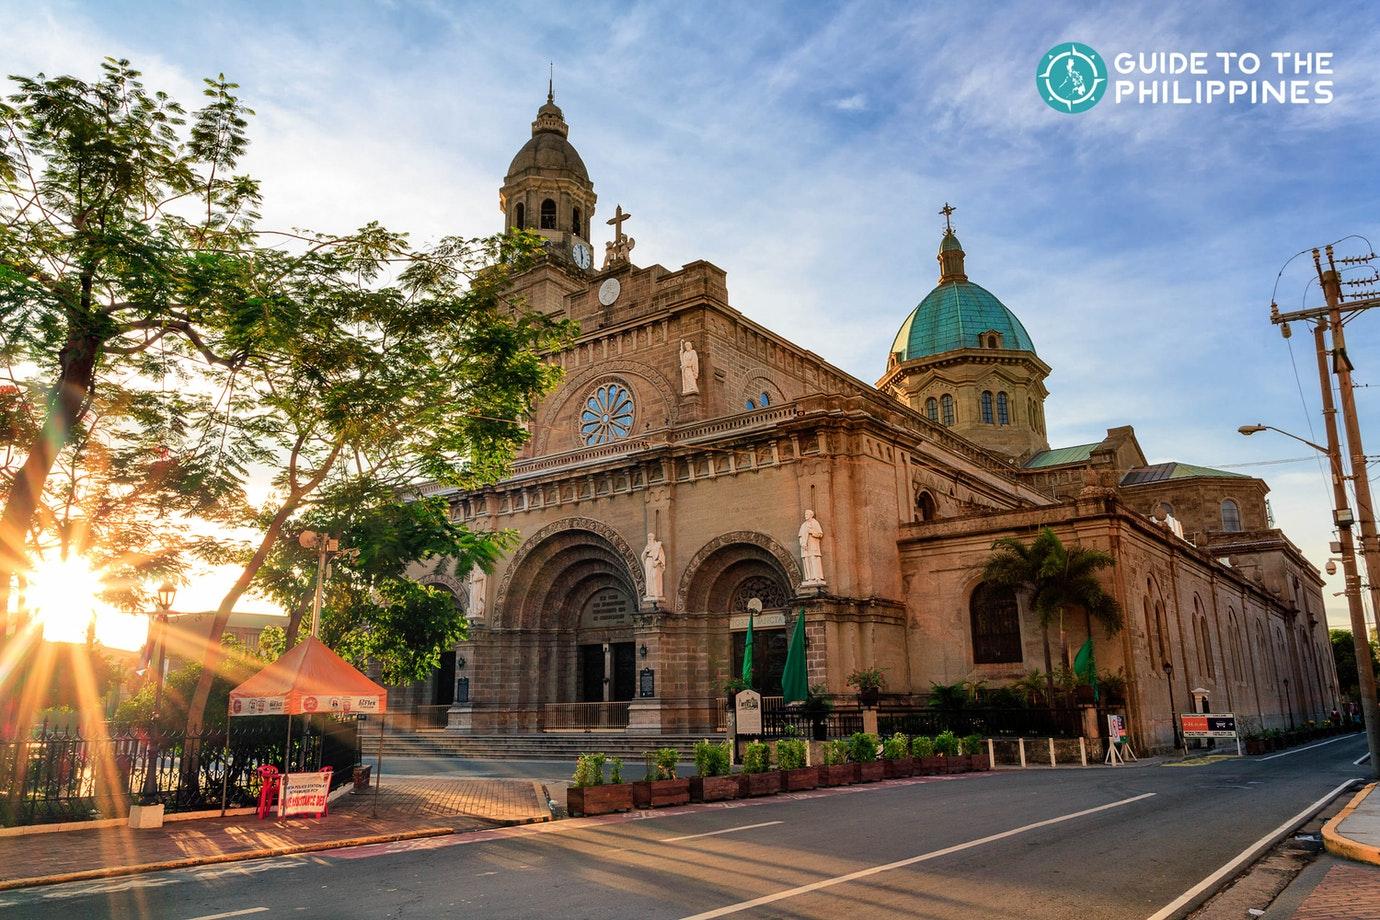 Manila Cathedral in Intramuros, Manila